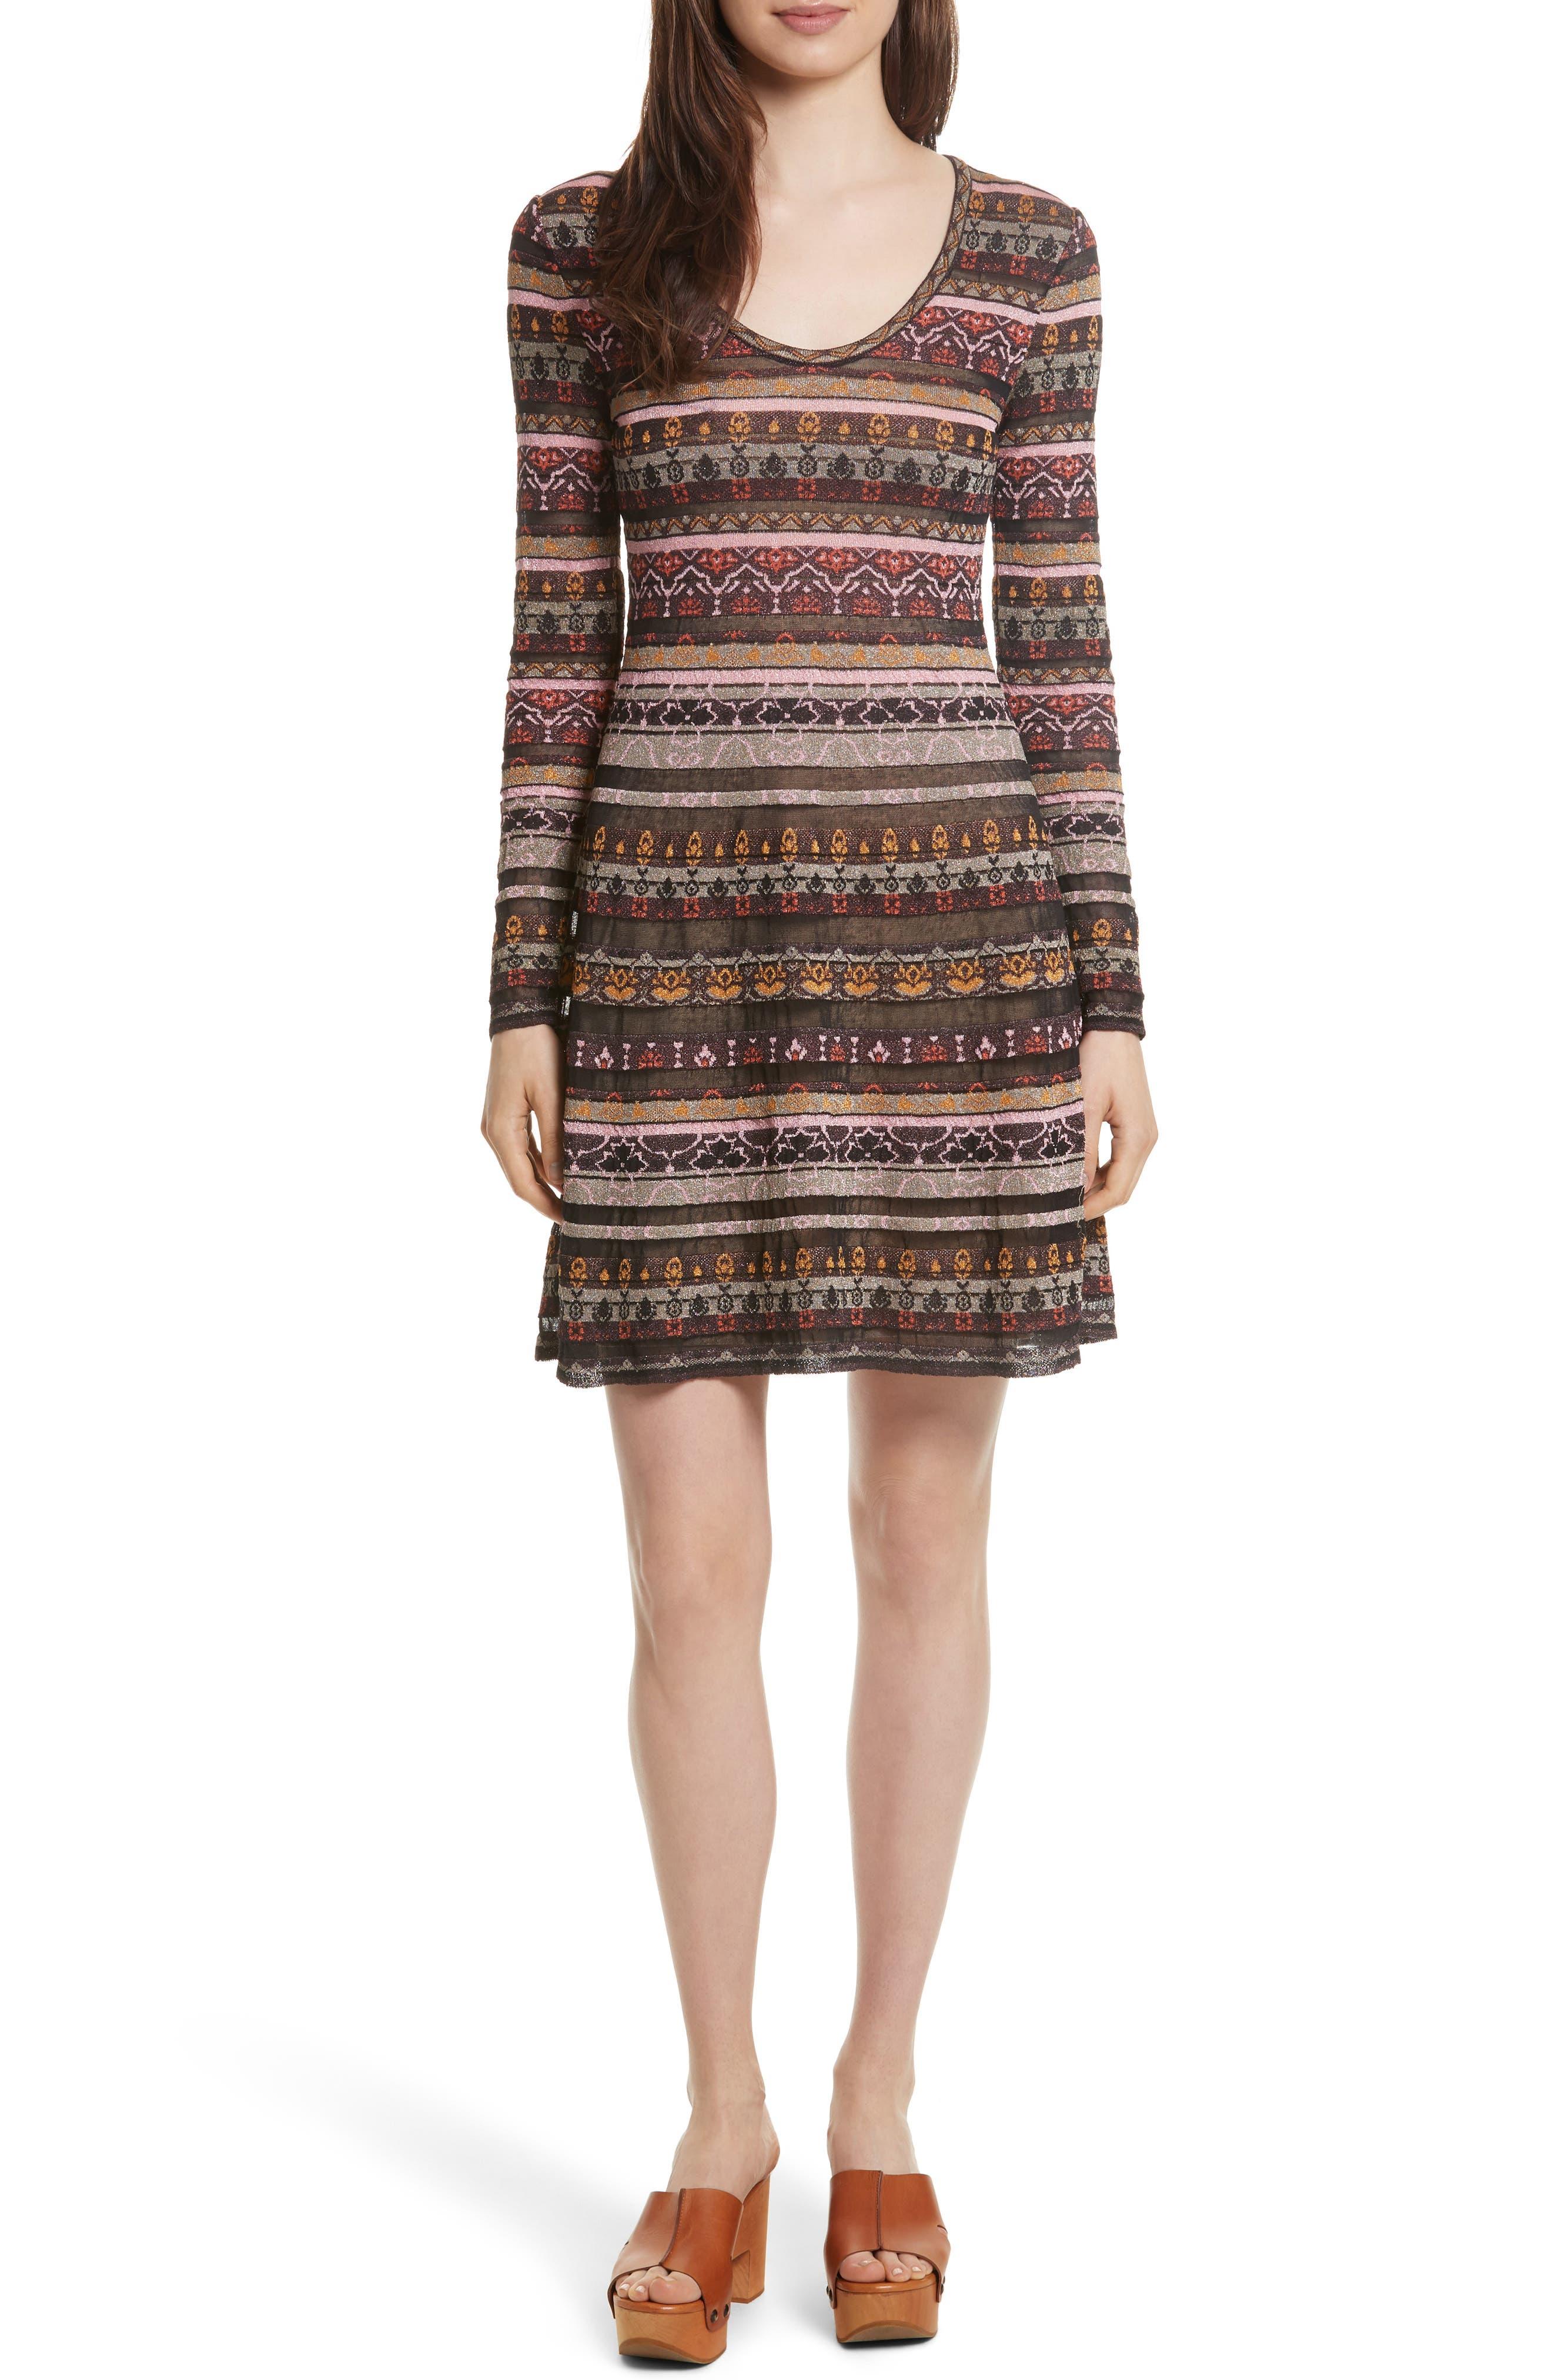 Alternate Image 1 Selected - M Missoni Floral Jacquard Dress